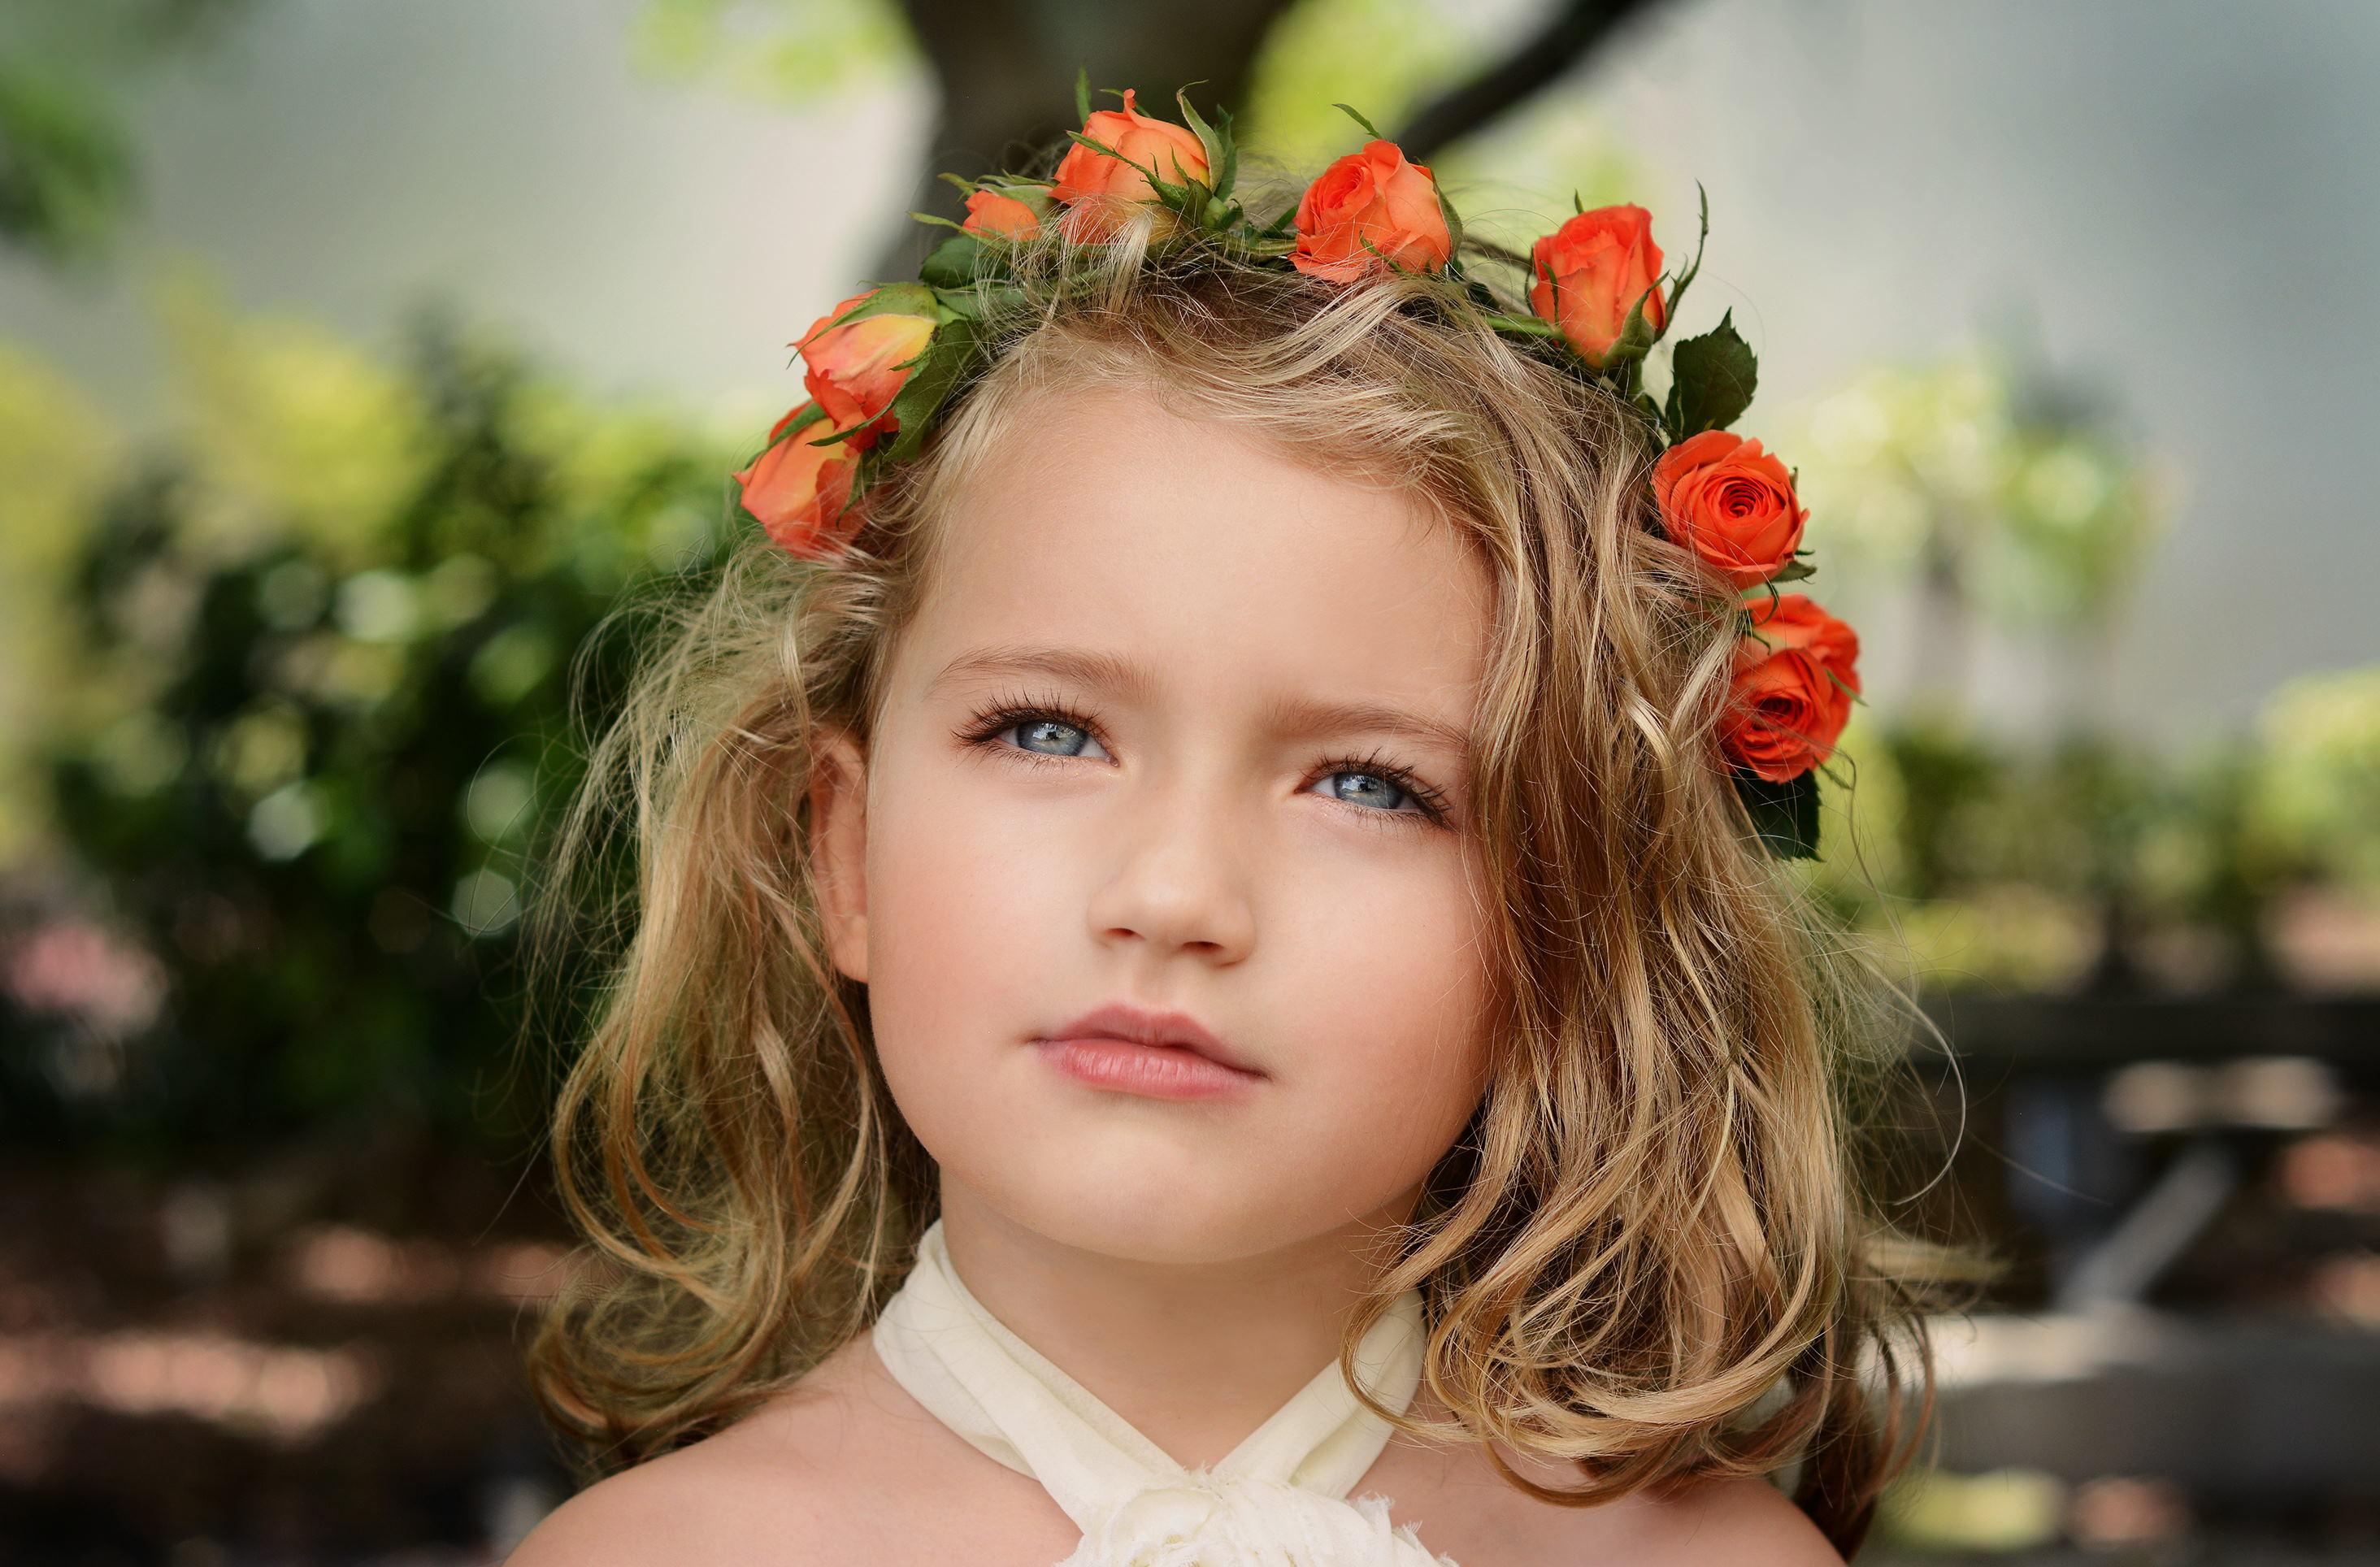 – 8 c Katherine Eastman portrait photography Miami south florida beauty fairytale fashion babiekins ohio blog flower crown flower girl